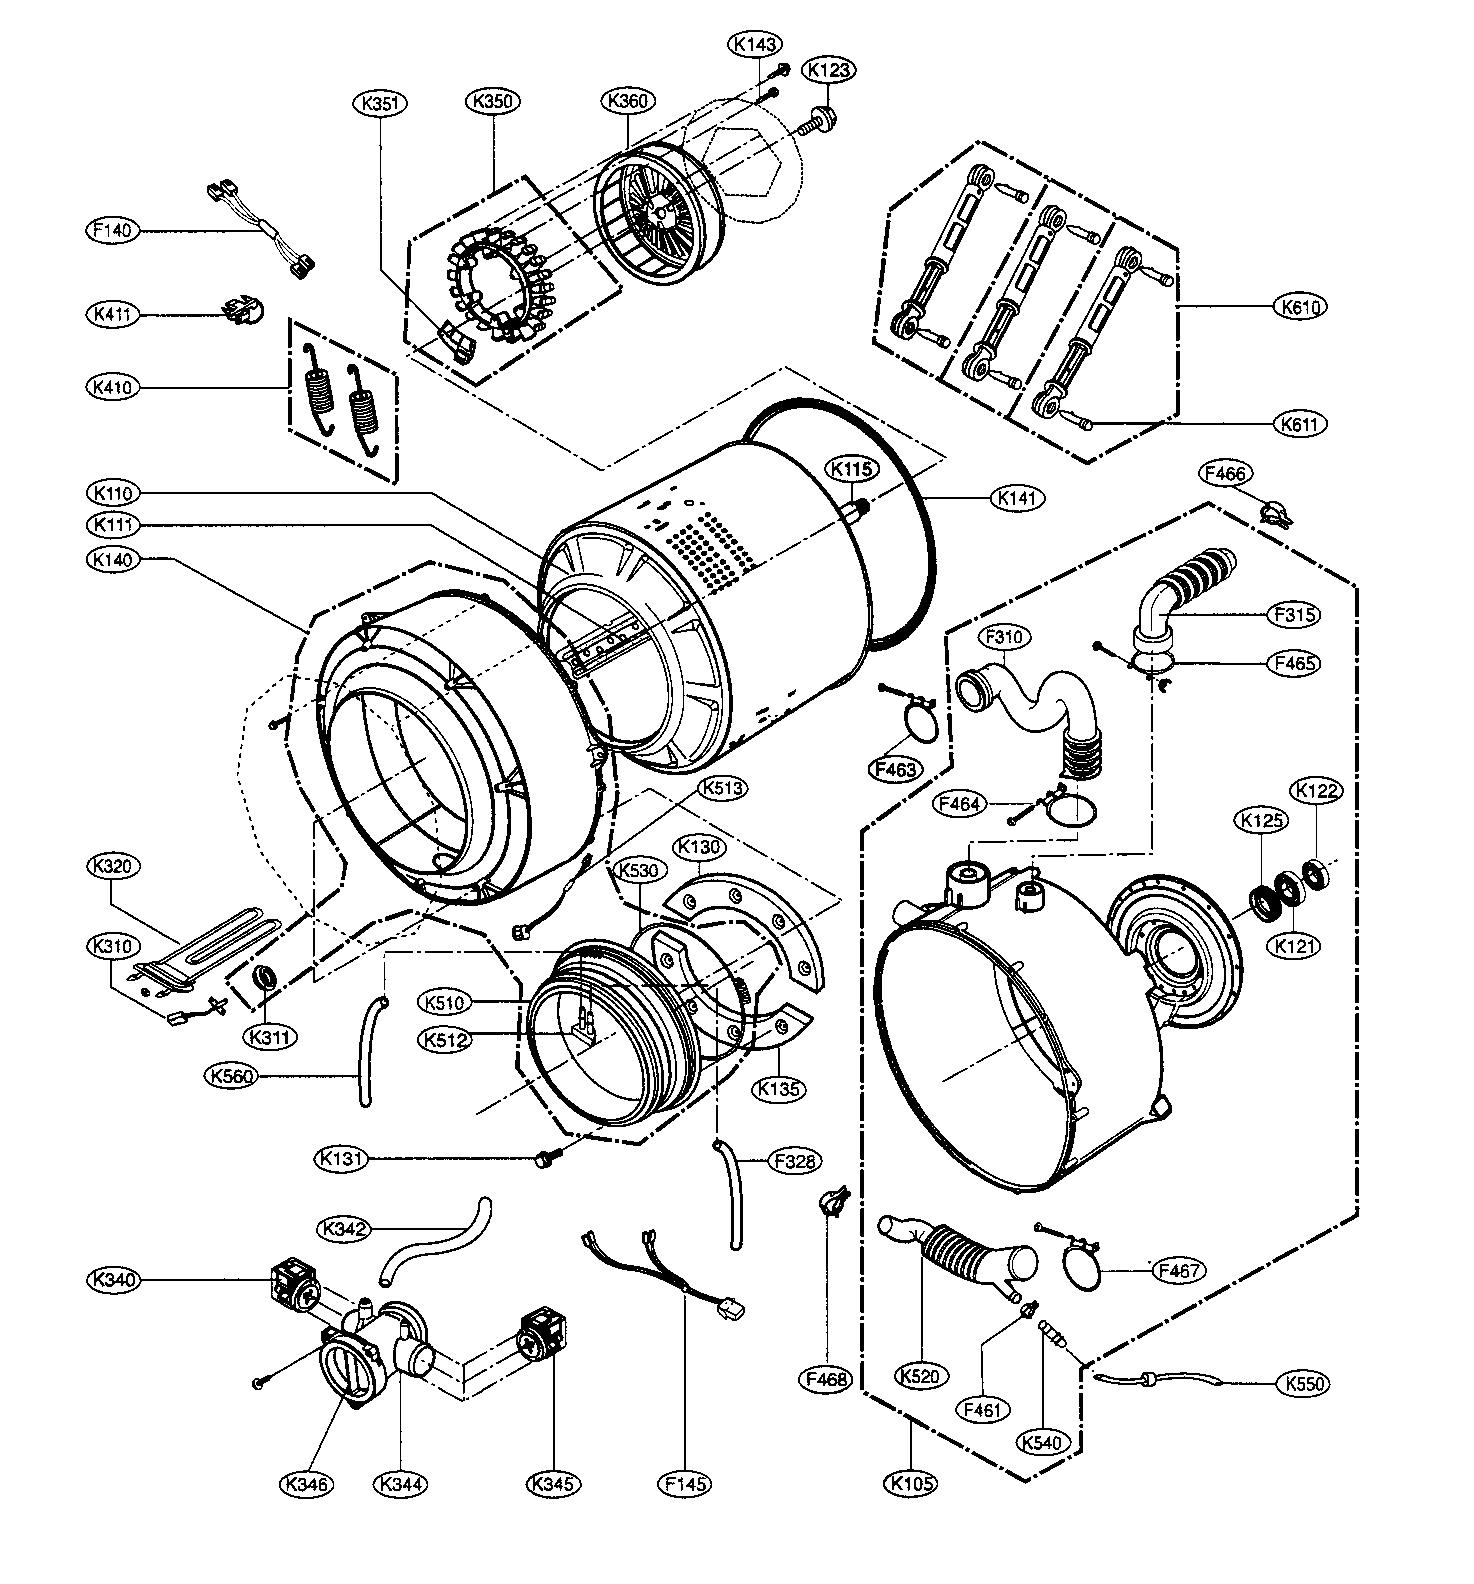 Lg model WM2688HWM residential washers genuine parts